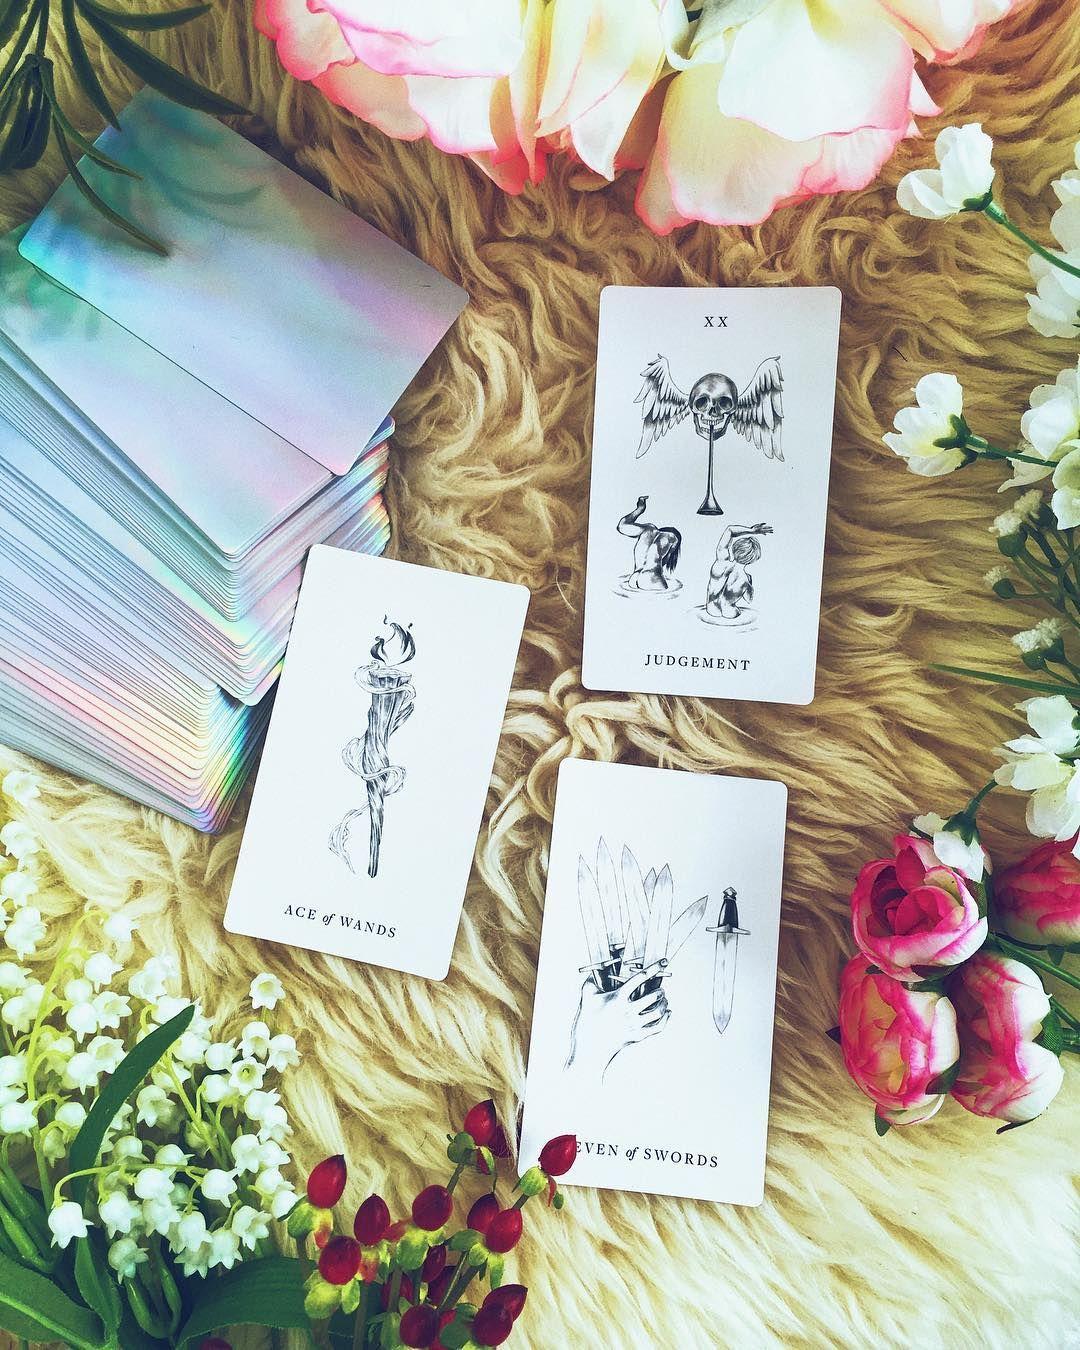 Luminous Spirit Tarot Deck Tarot cards for beginners